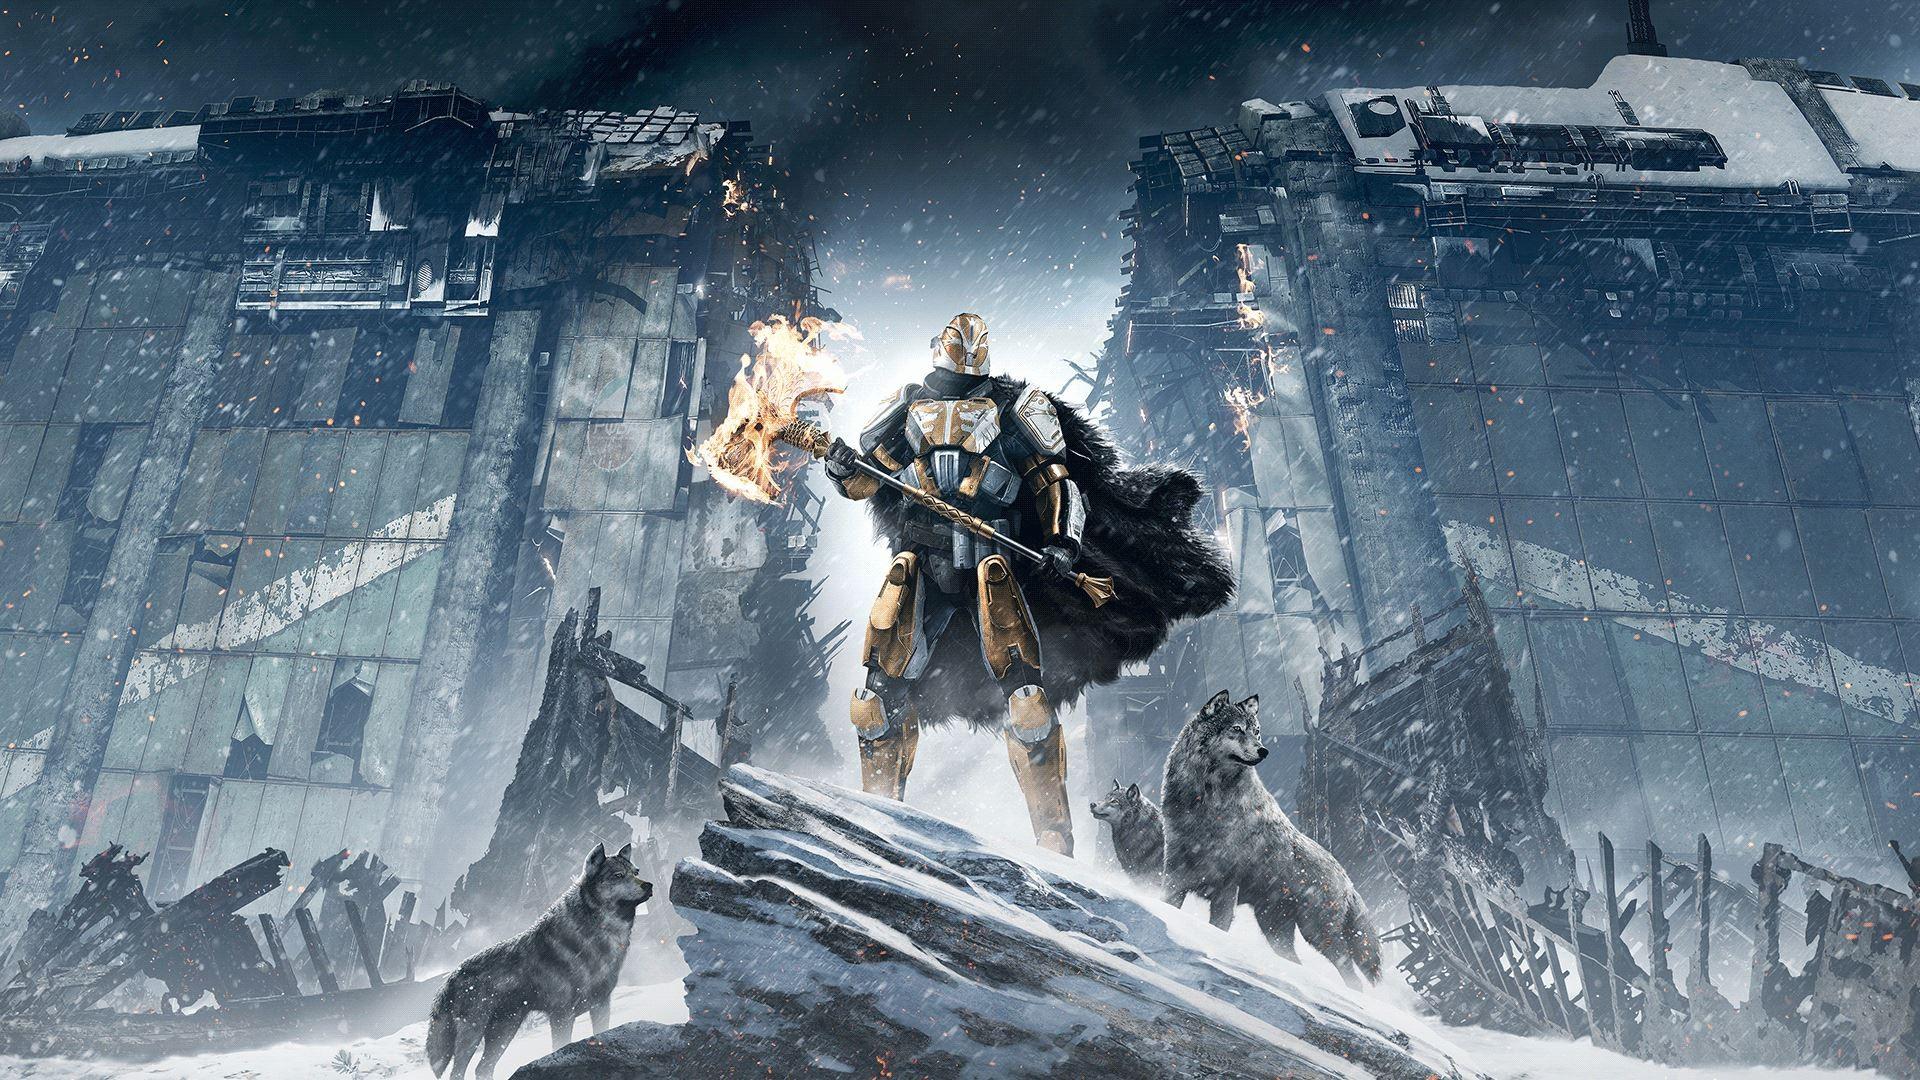 Destiny Rise Of Iron Wallpaper Download Free Stunning Full Hd